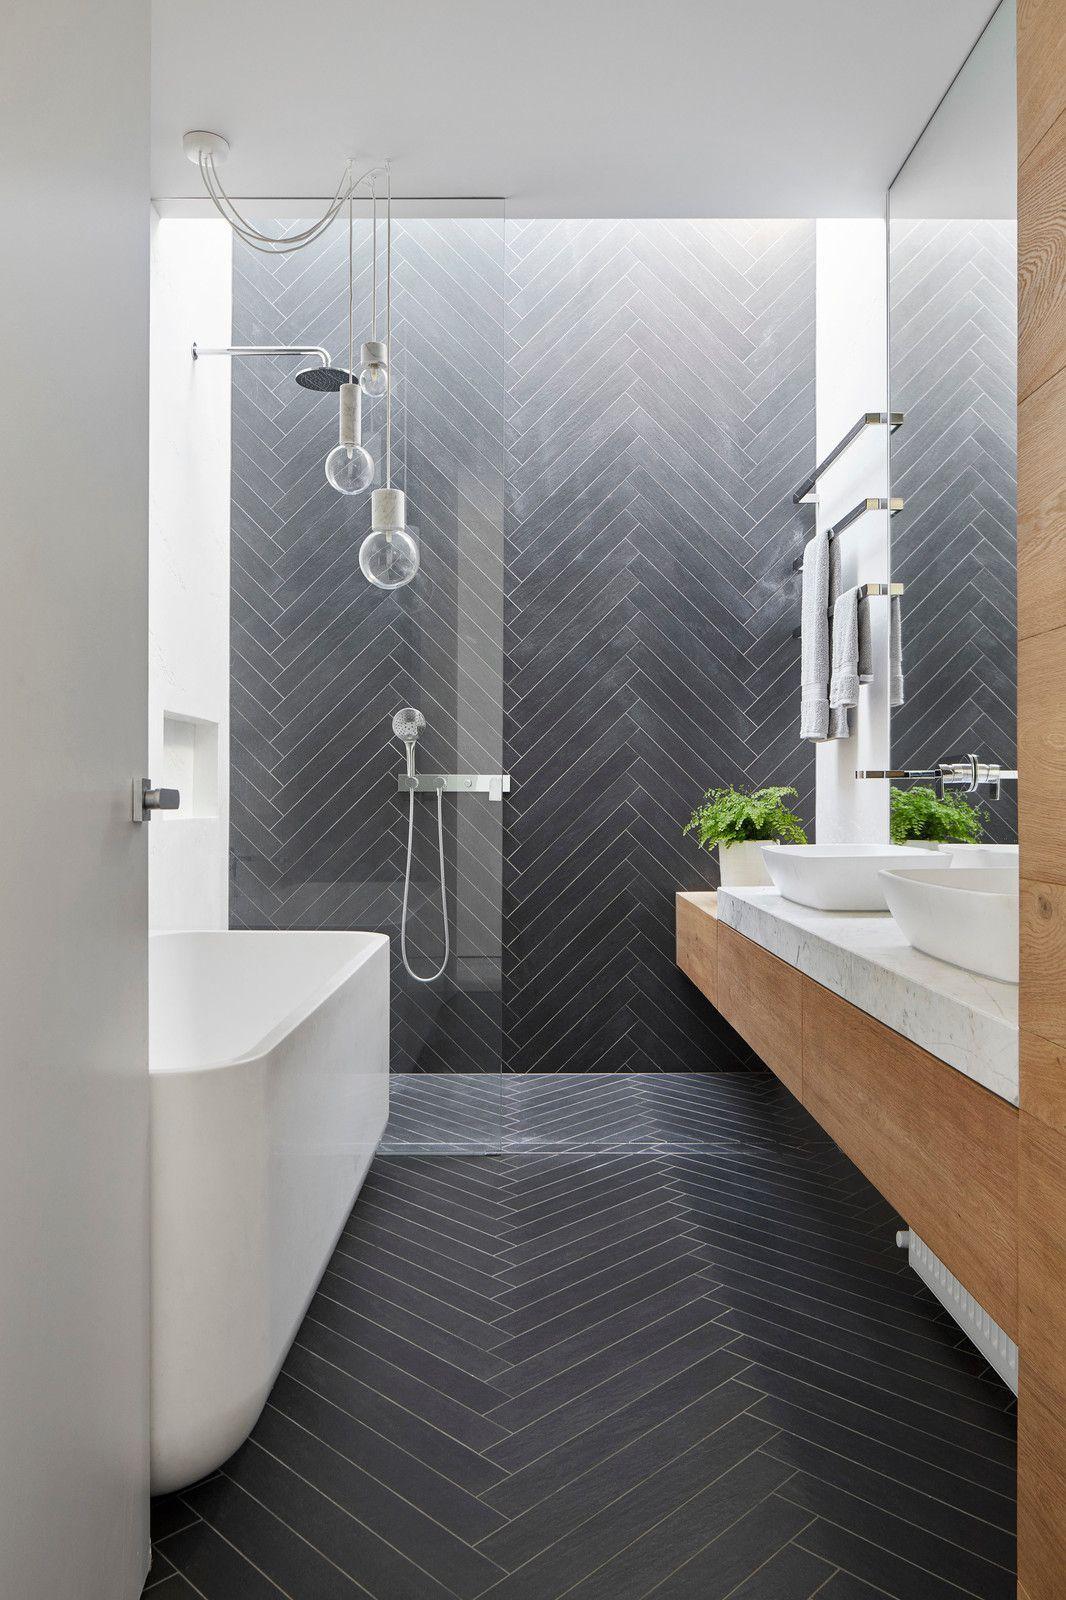 Inspiration For A Small Contemporary Master Black Tile And Porcelain Tile Porcelain Floo Salle De Bains Carrelage Gris Salle De Bains Moderne Salle De Bain 6m2